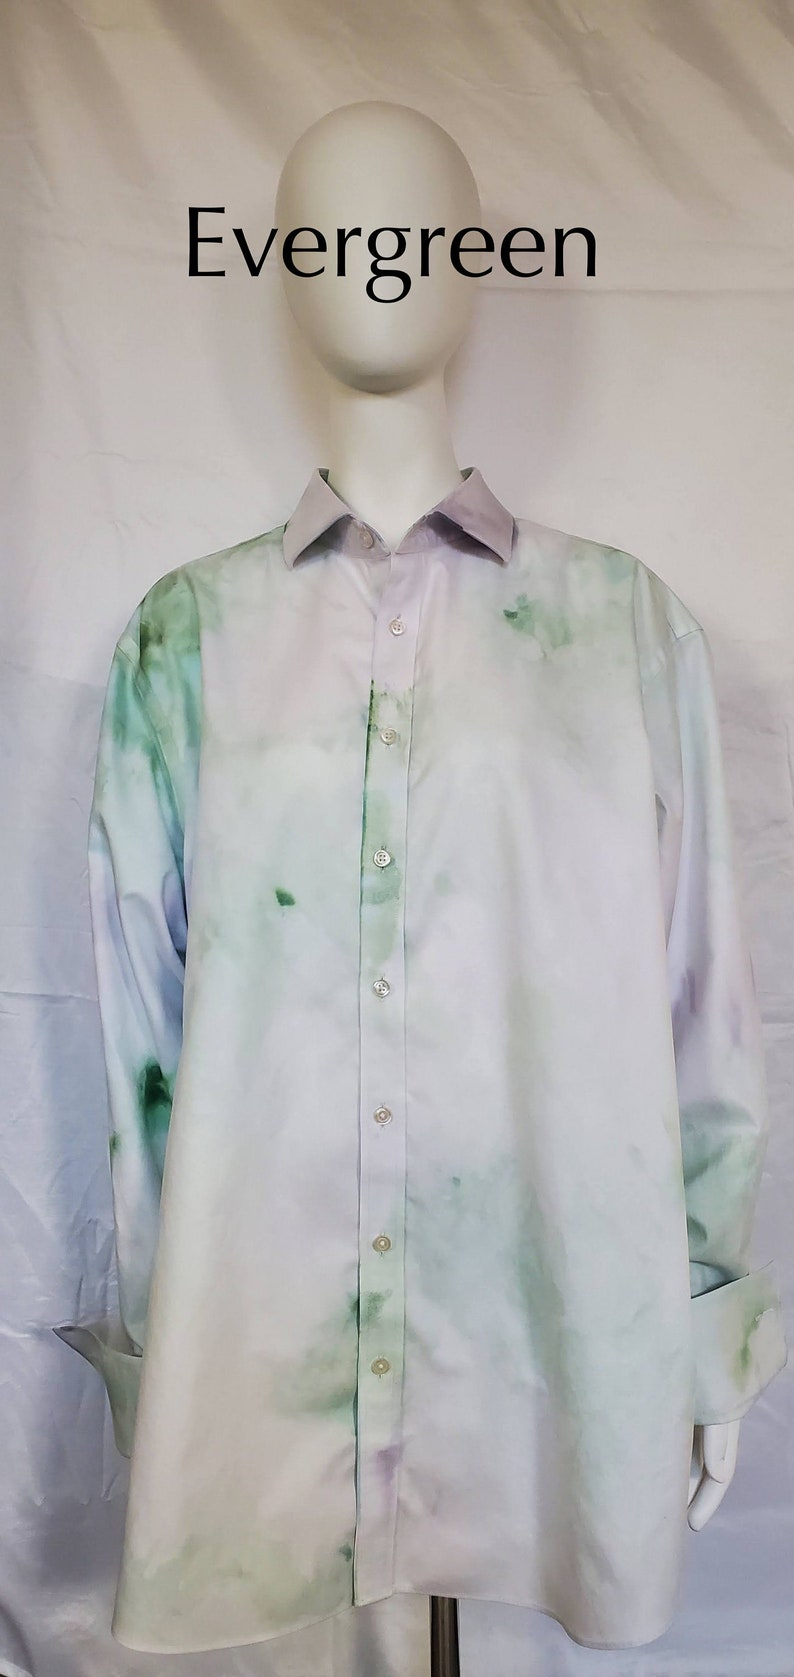 Tunic Oversized Ice Dye Tie Dye Shirt Dress Unisex Dress Shirt